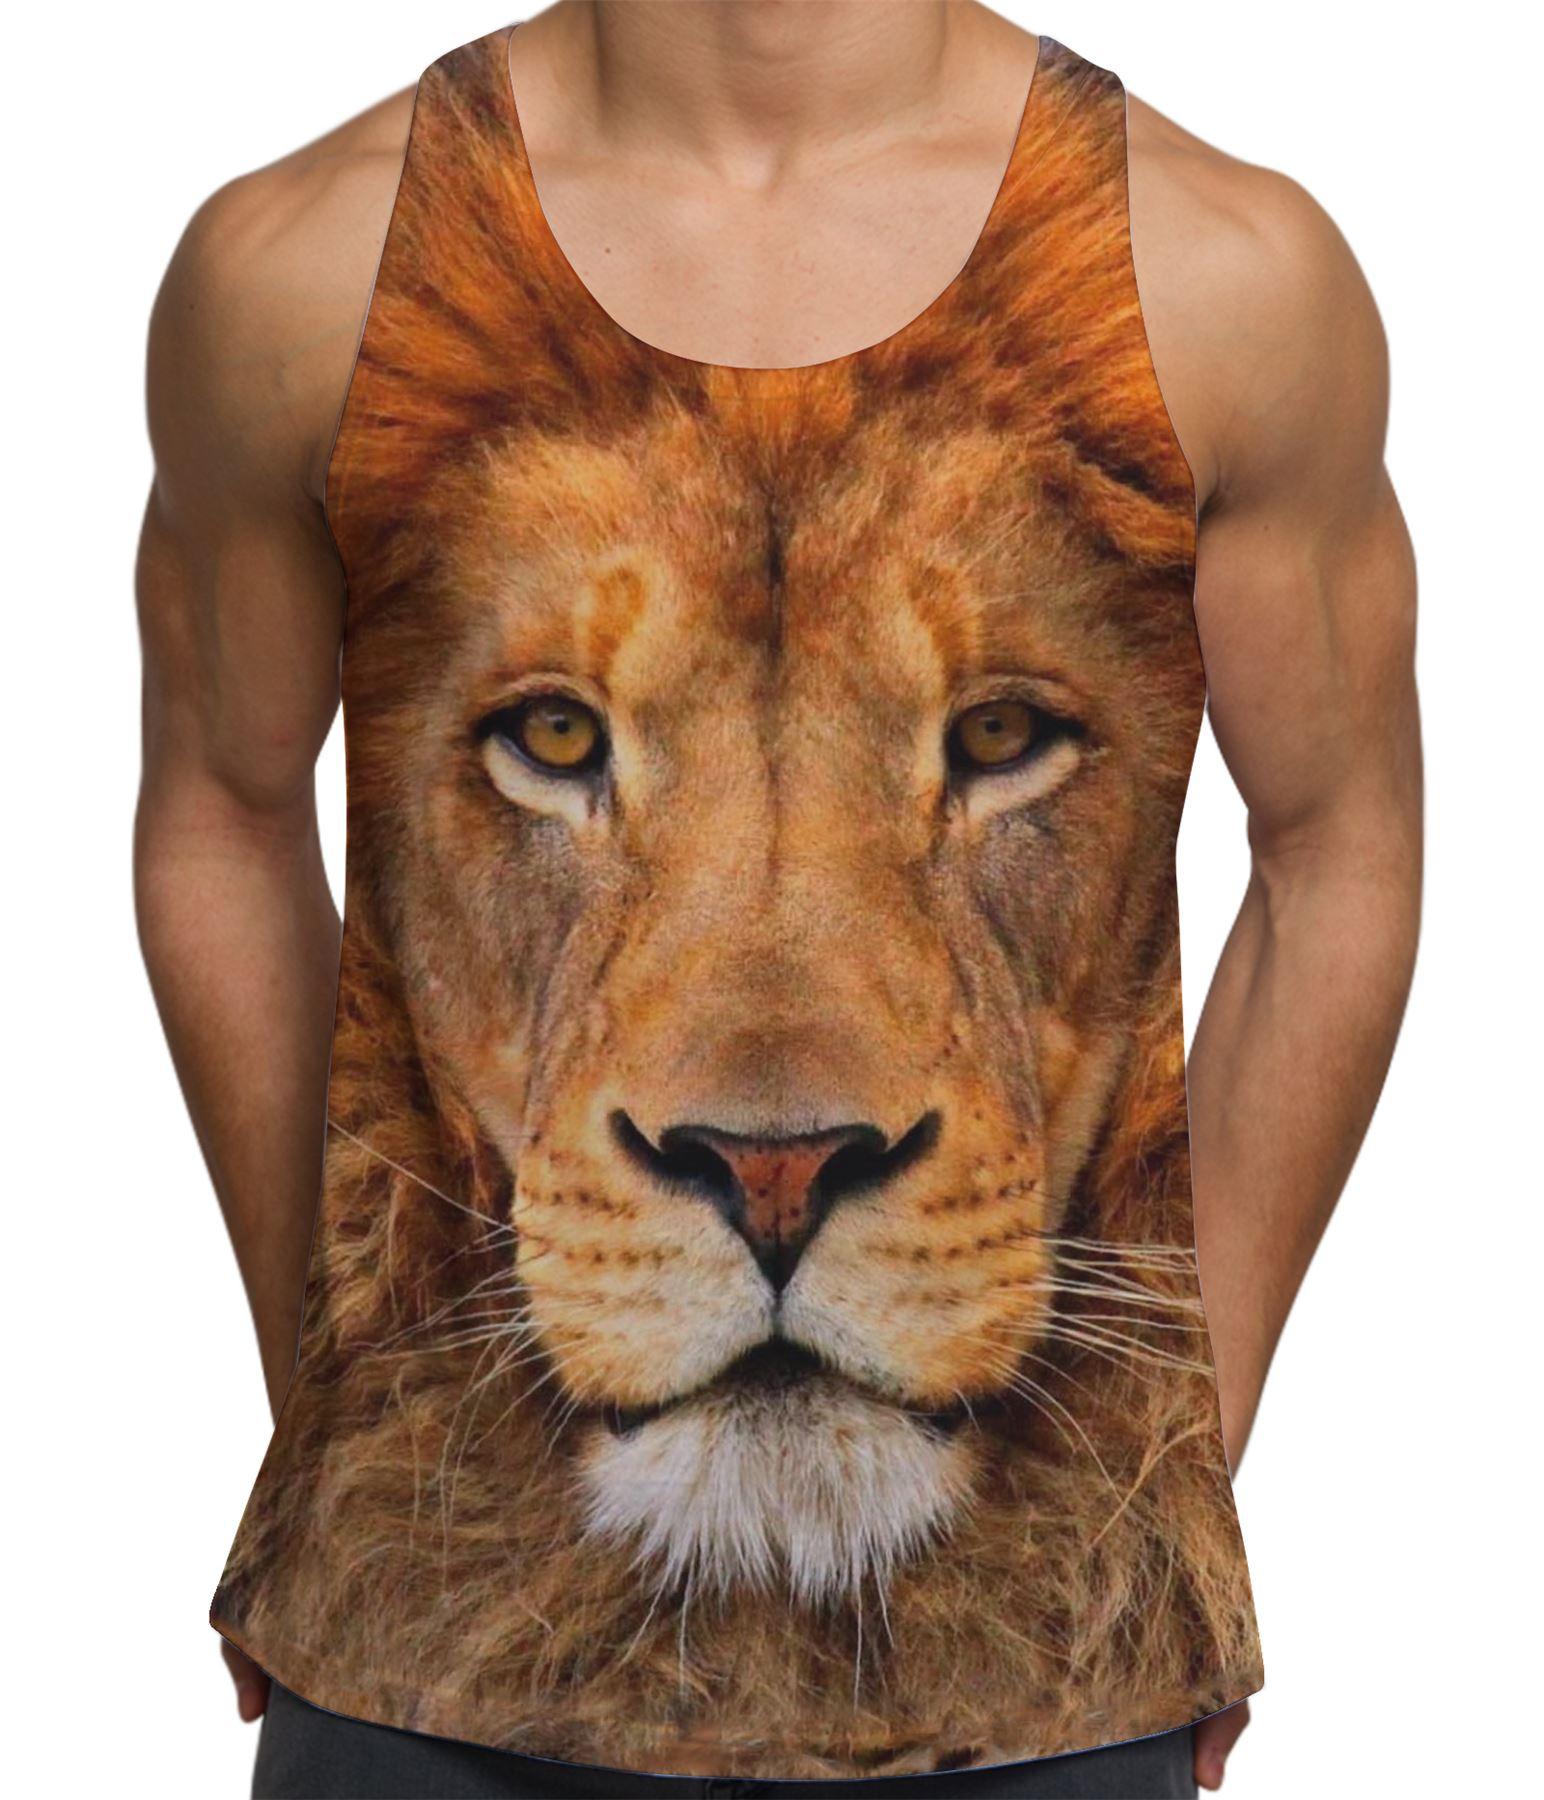 Lion Face Animal Print Vest Printed Tank Top Summer Festival Clothes S-XXL